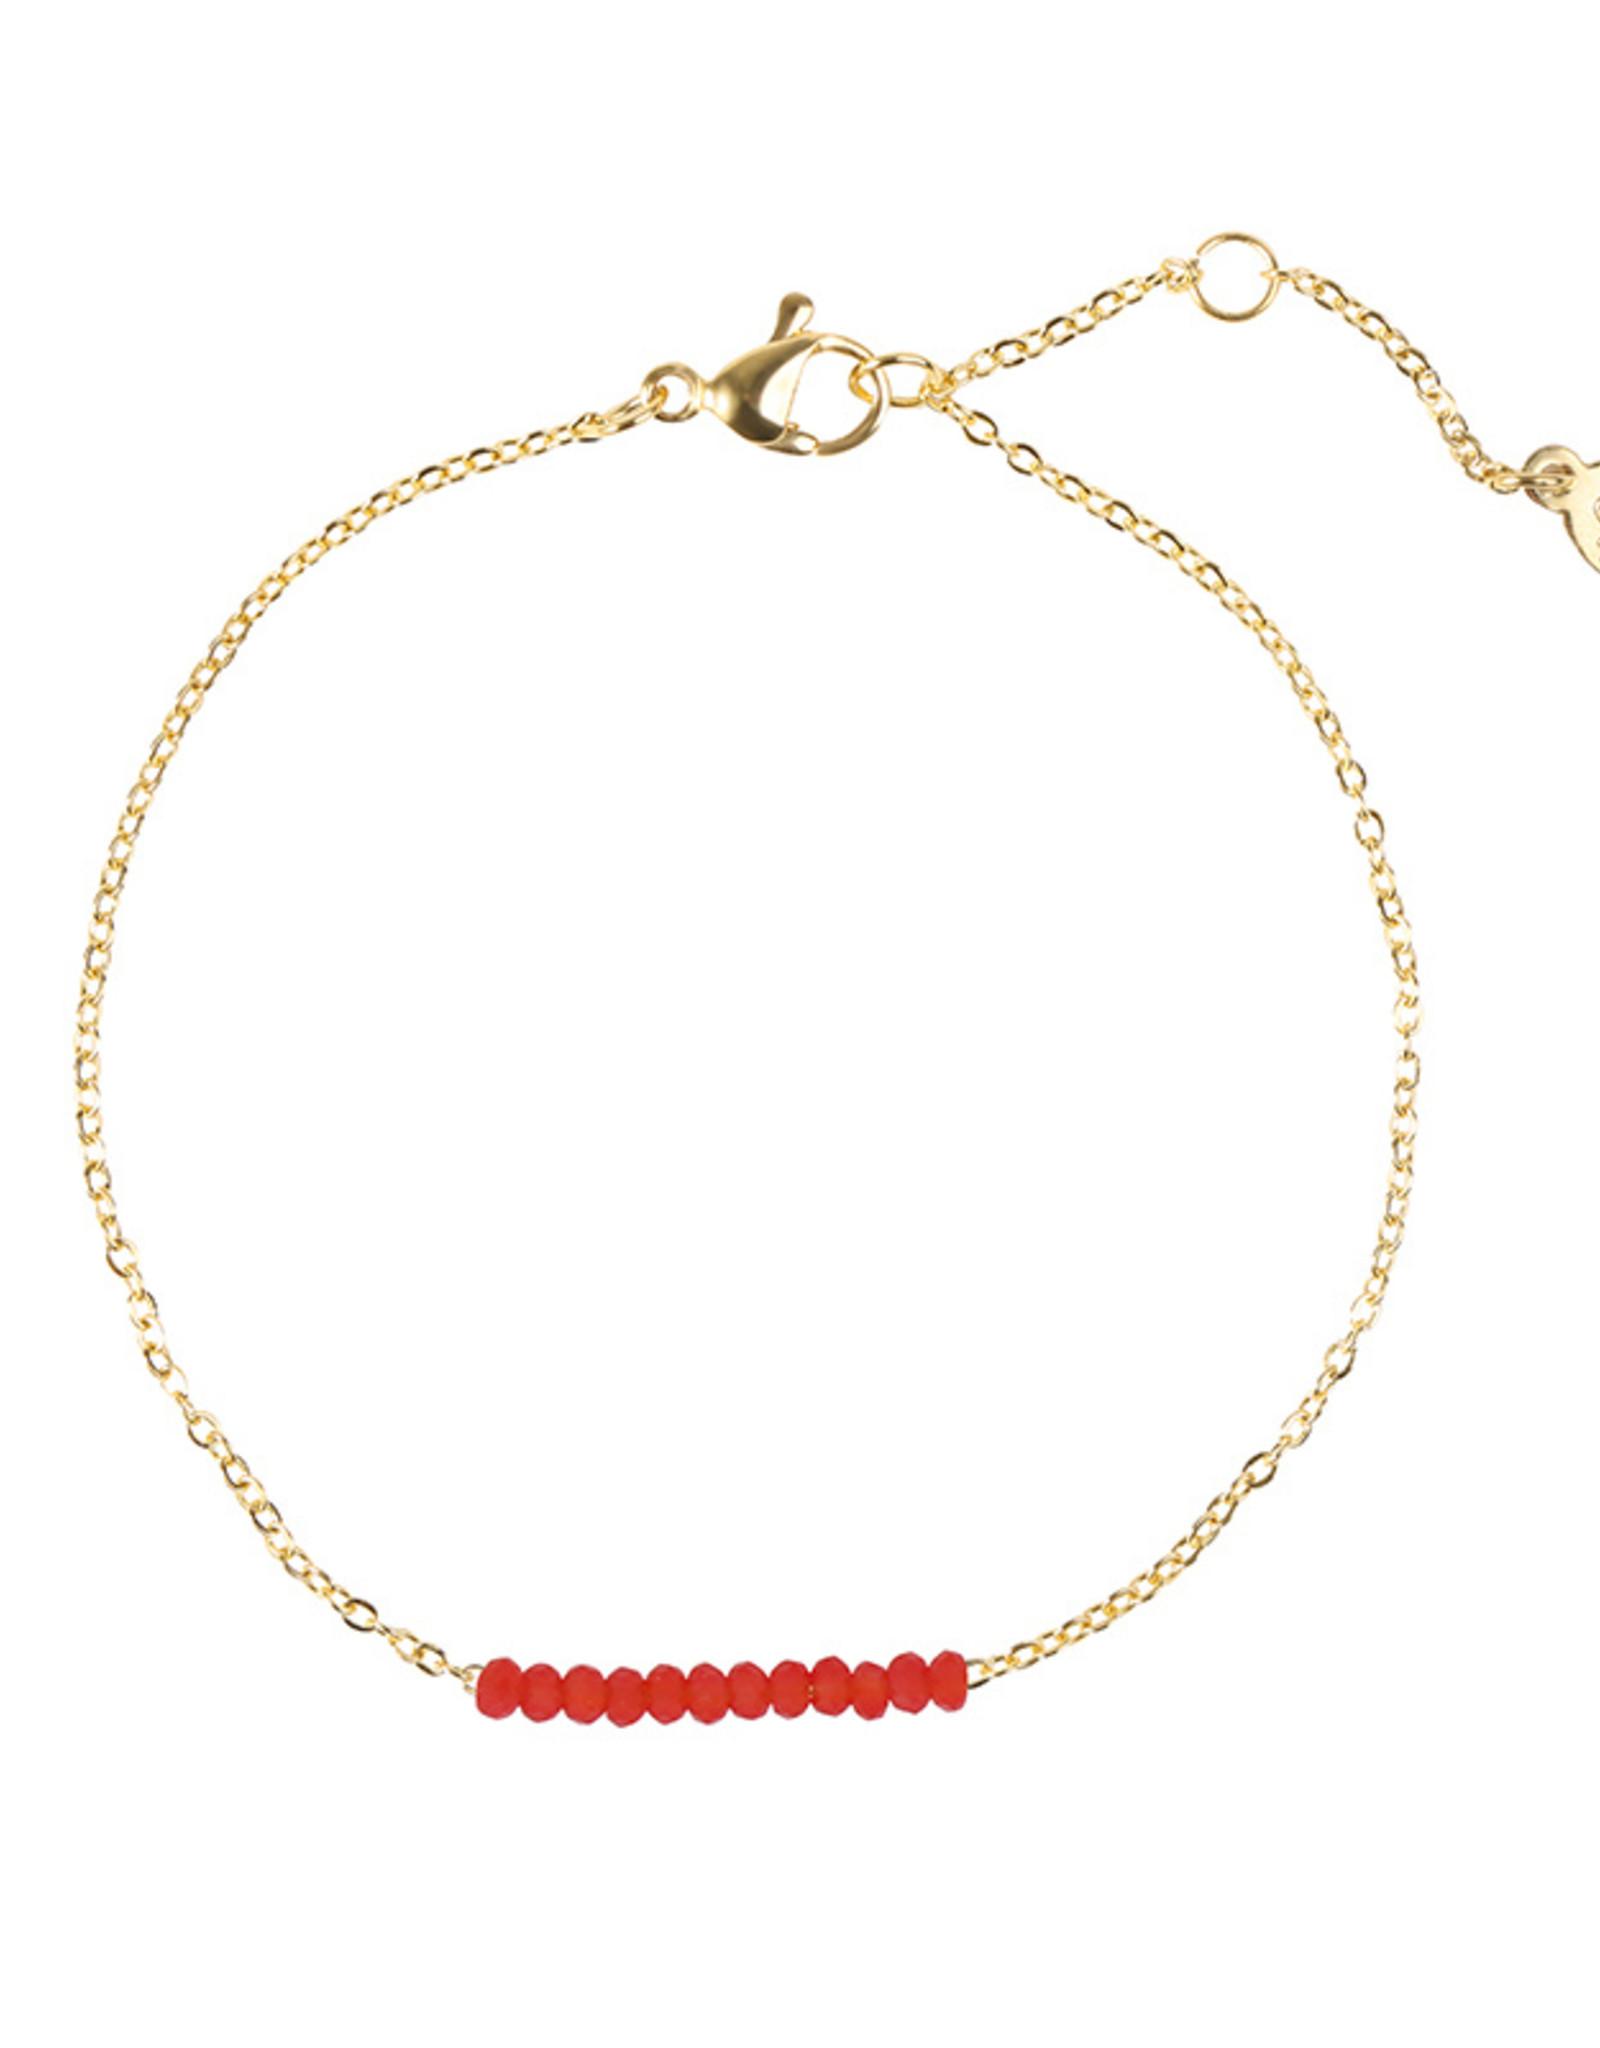 Armband met rode subtiele kraaltjes